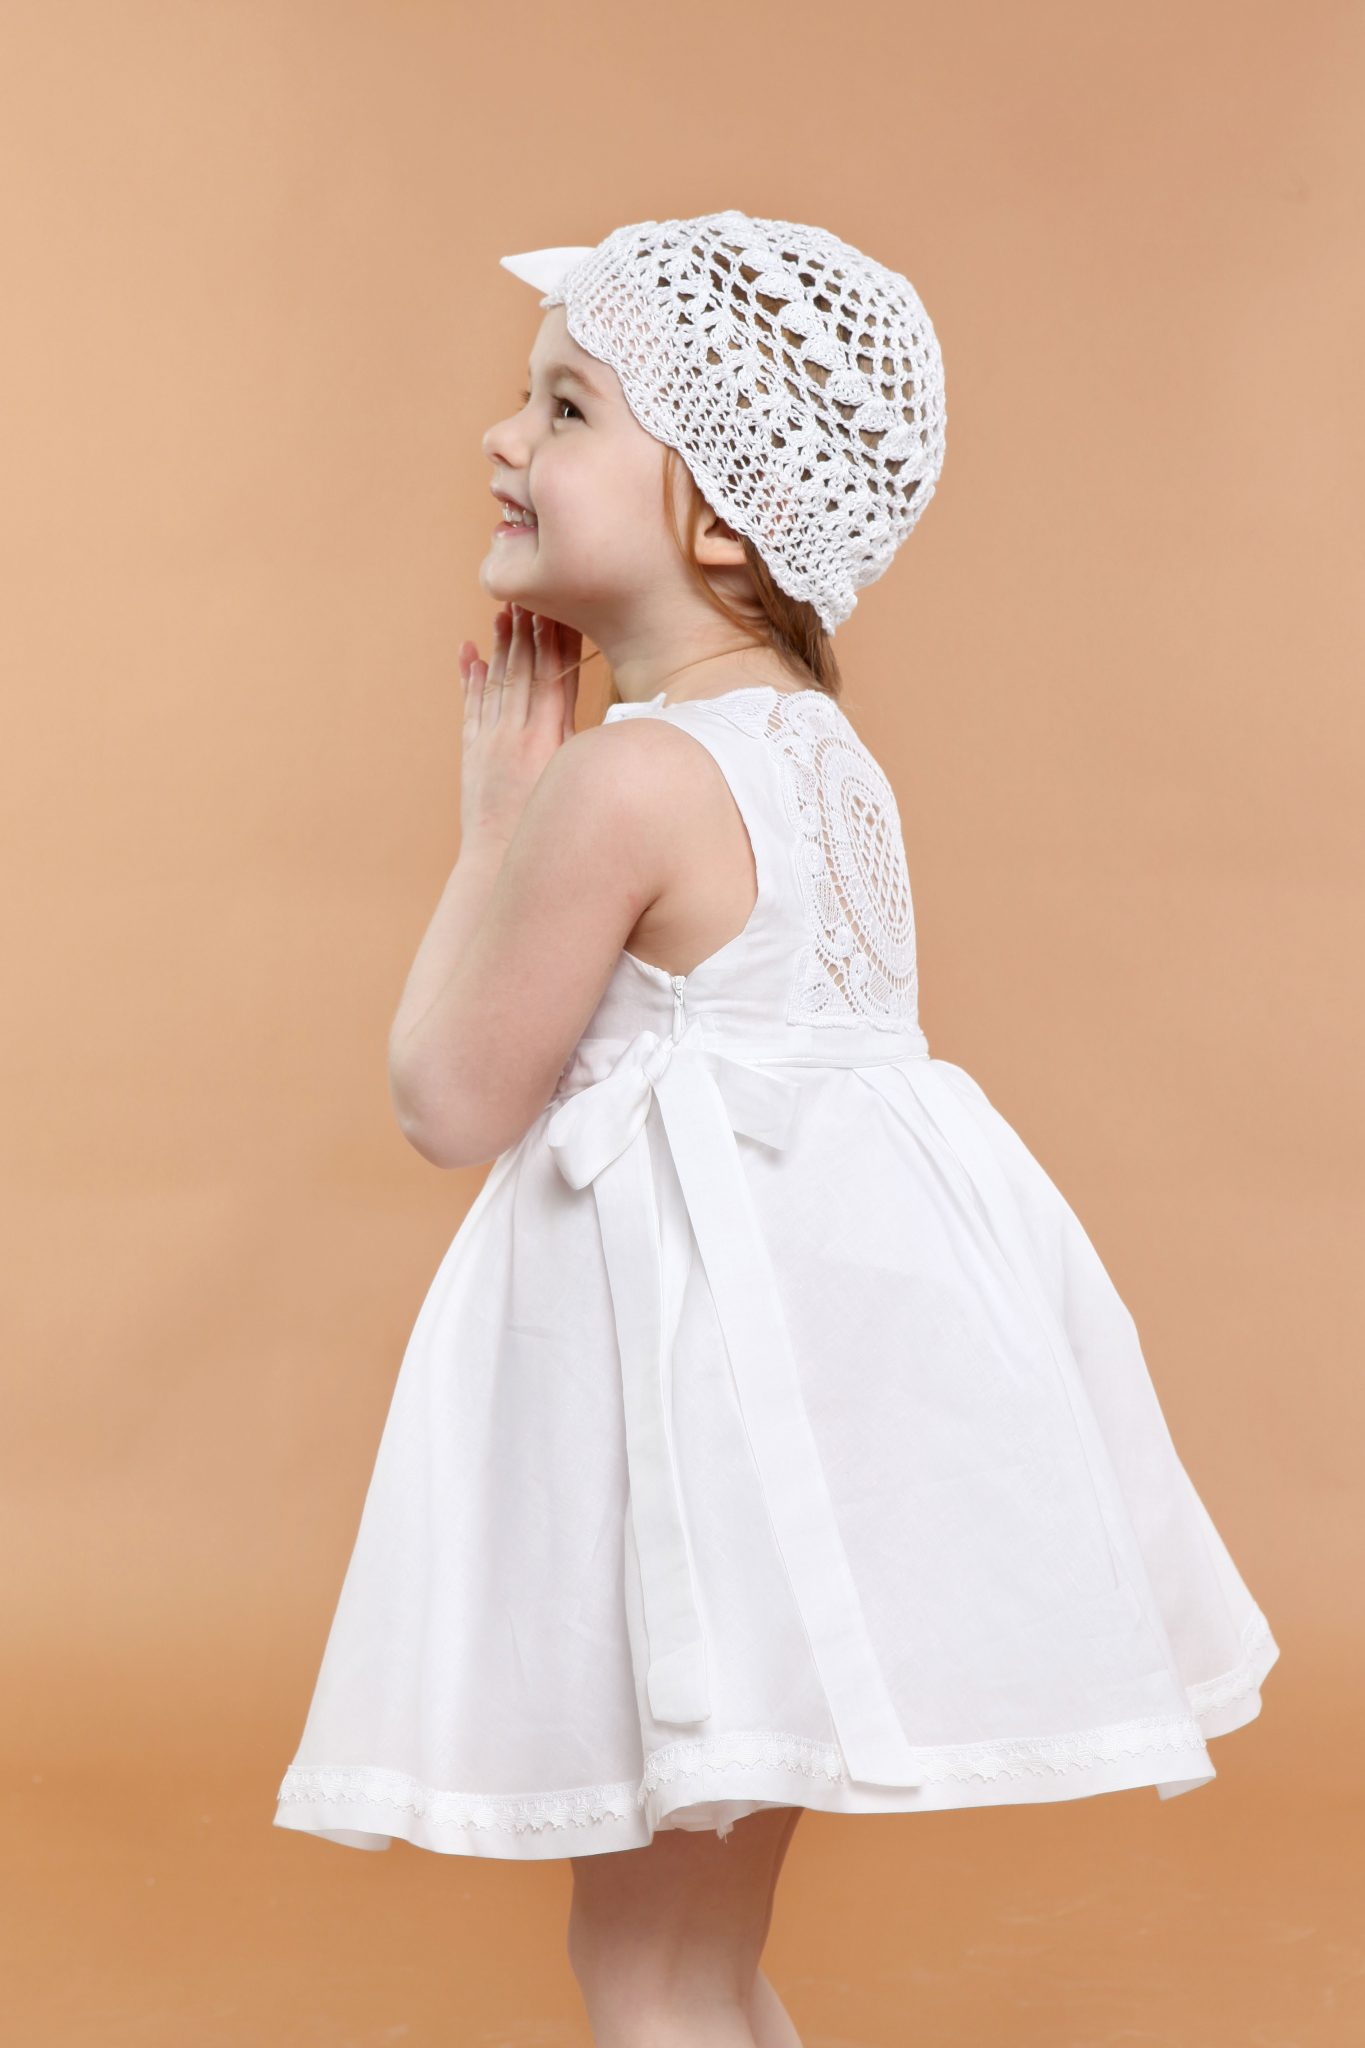 9bd53e88eda Βαπτιστικά Ρούχα για Κορίτσι 117 | Γάμος & Βάπτιση στο Ηράκλειο Κρήτης